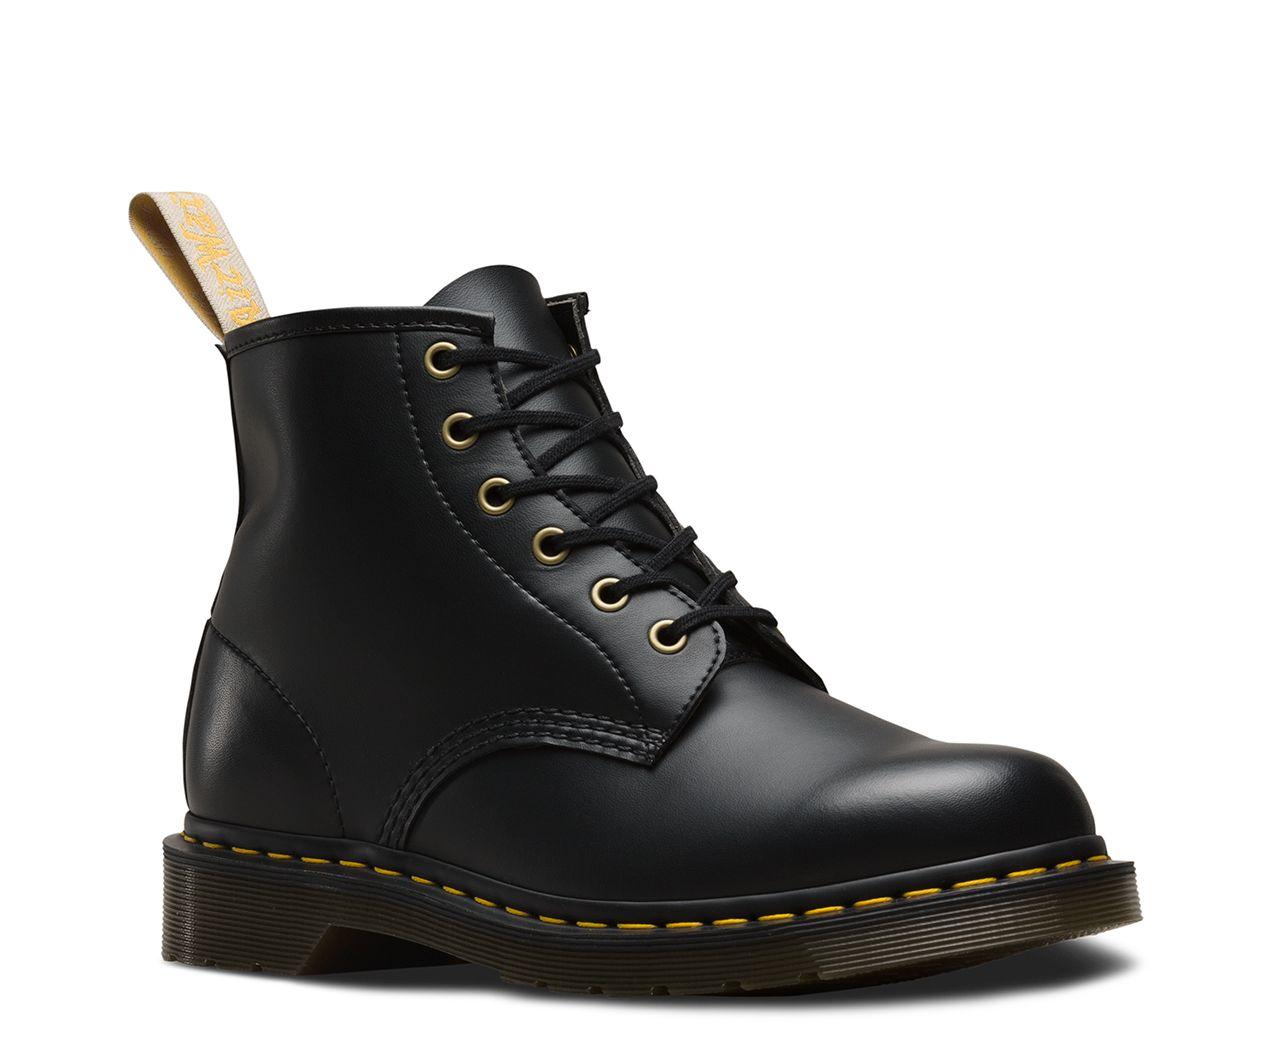 Dr martens vegan 101 | Shoes in 2019 | Doc martens boots, Dr